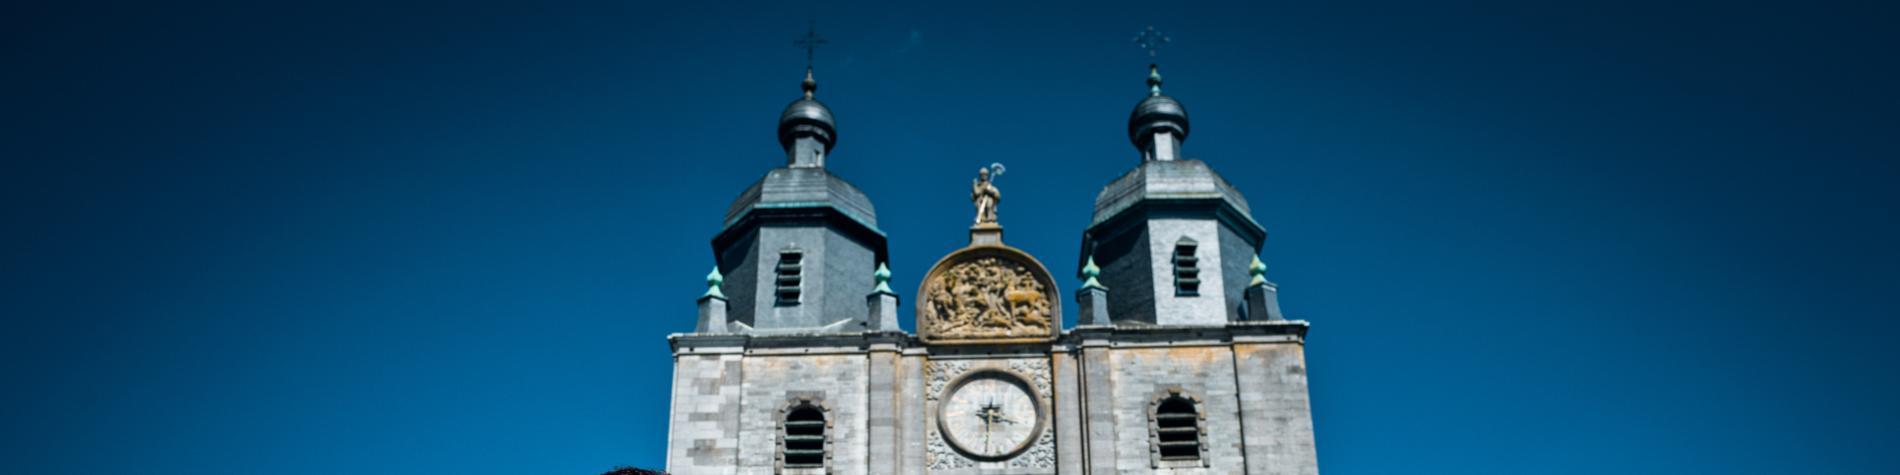 Basilique - Saint-Hubert